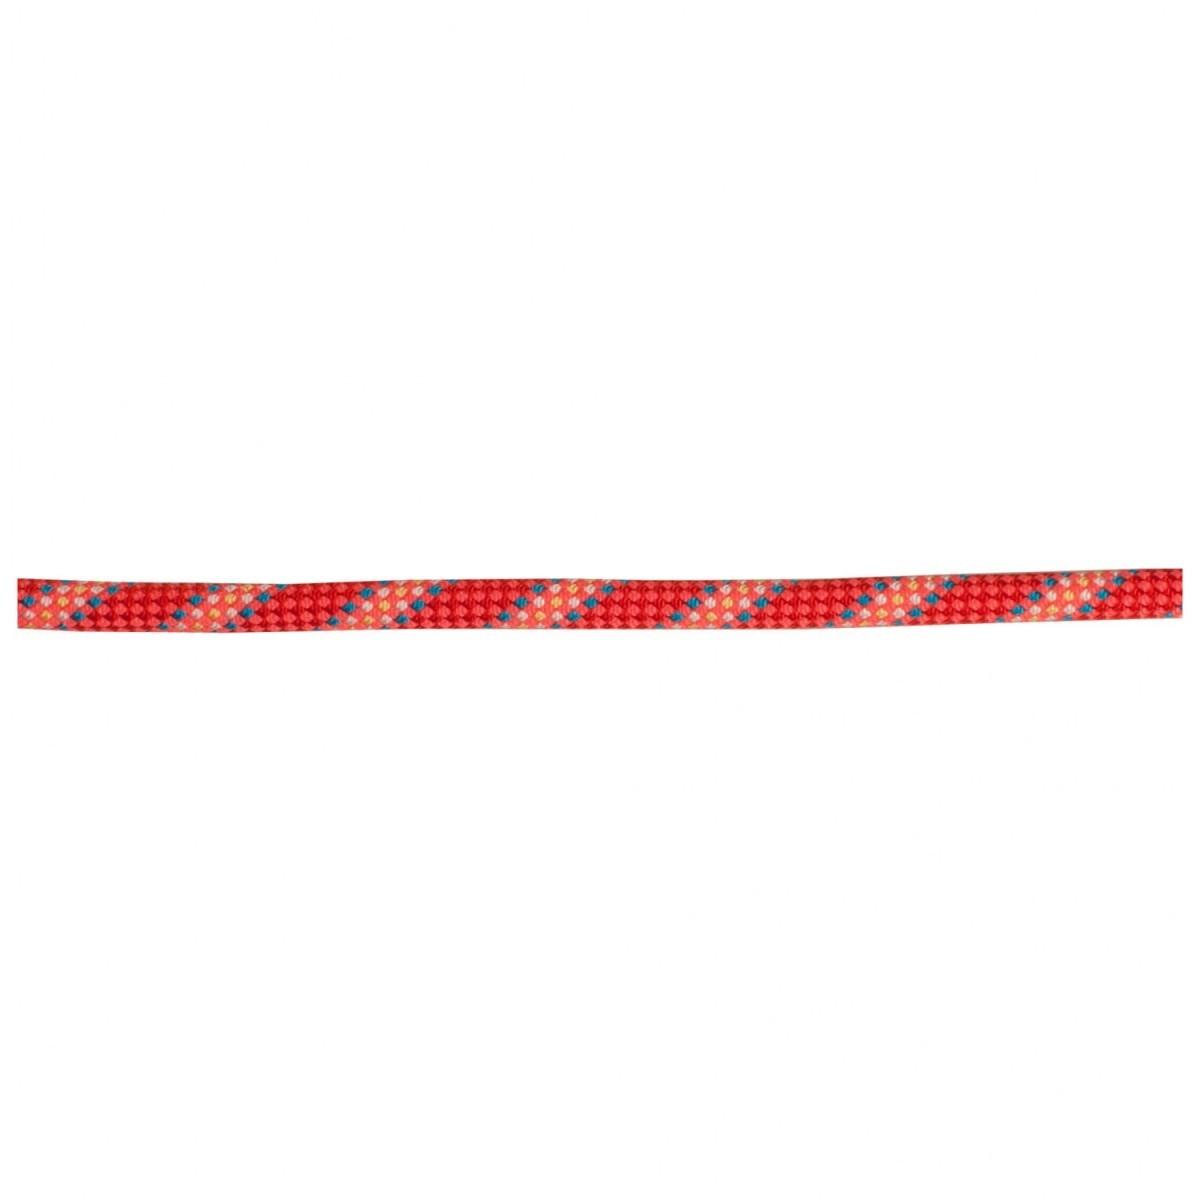 BEAL べアール Cobra II 8.6mm(60m - Orange)★ロープ・ザイル・登山・クライミング★